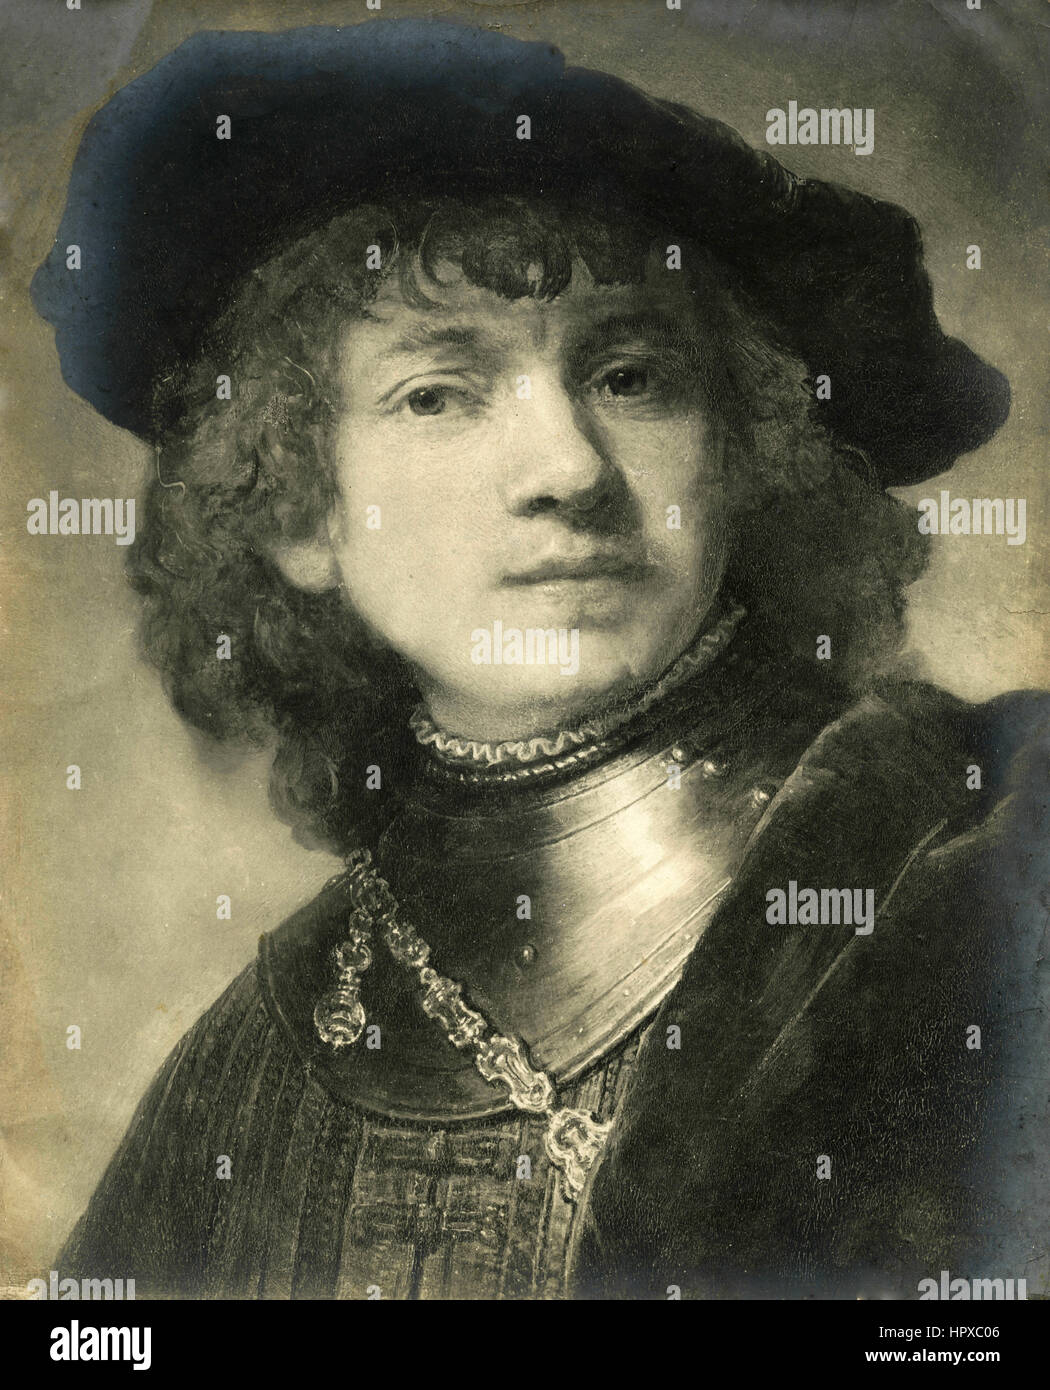 Rembrandt self-portrait - Stock Image